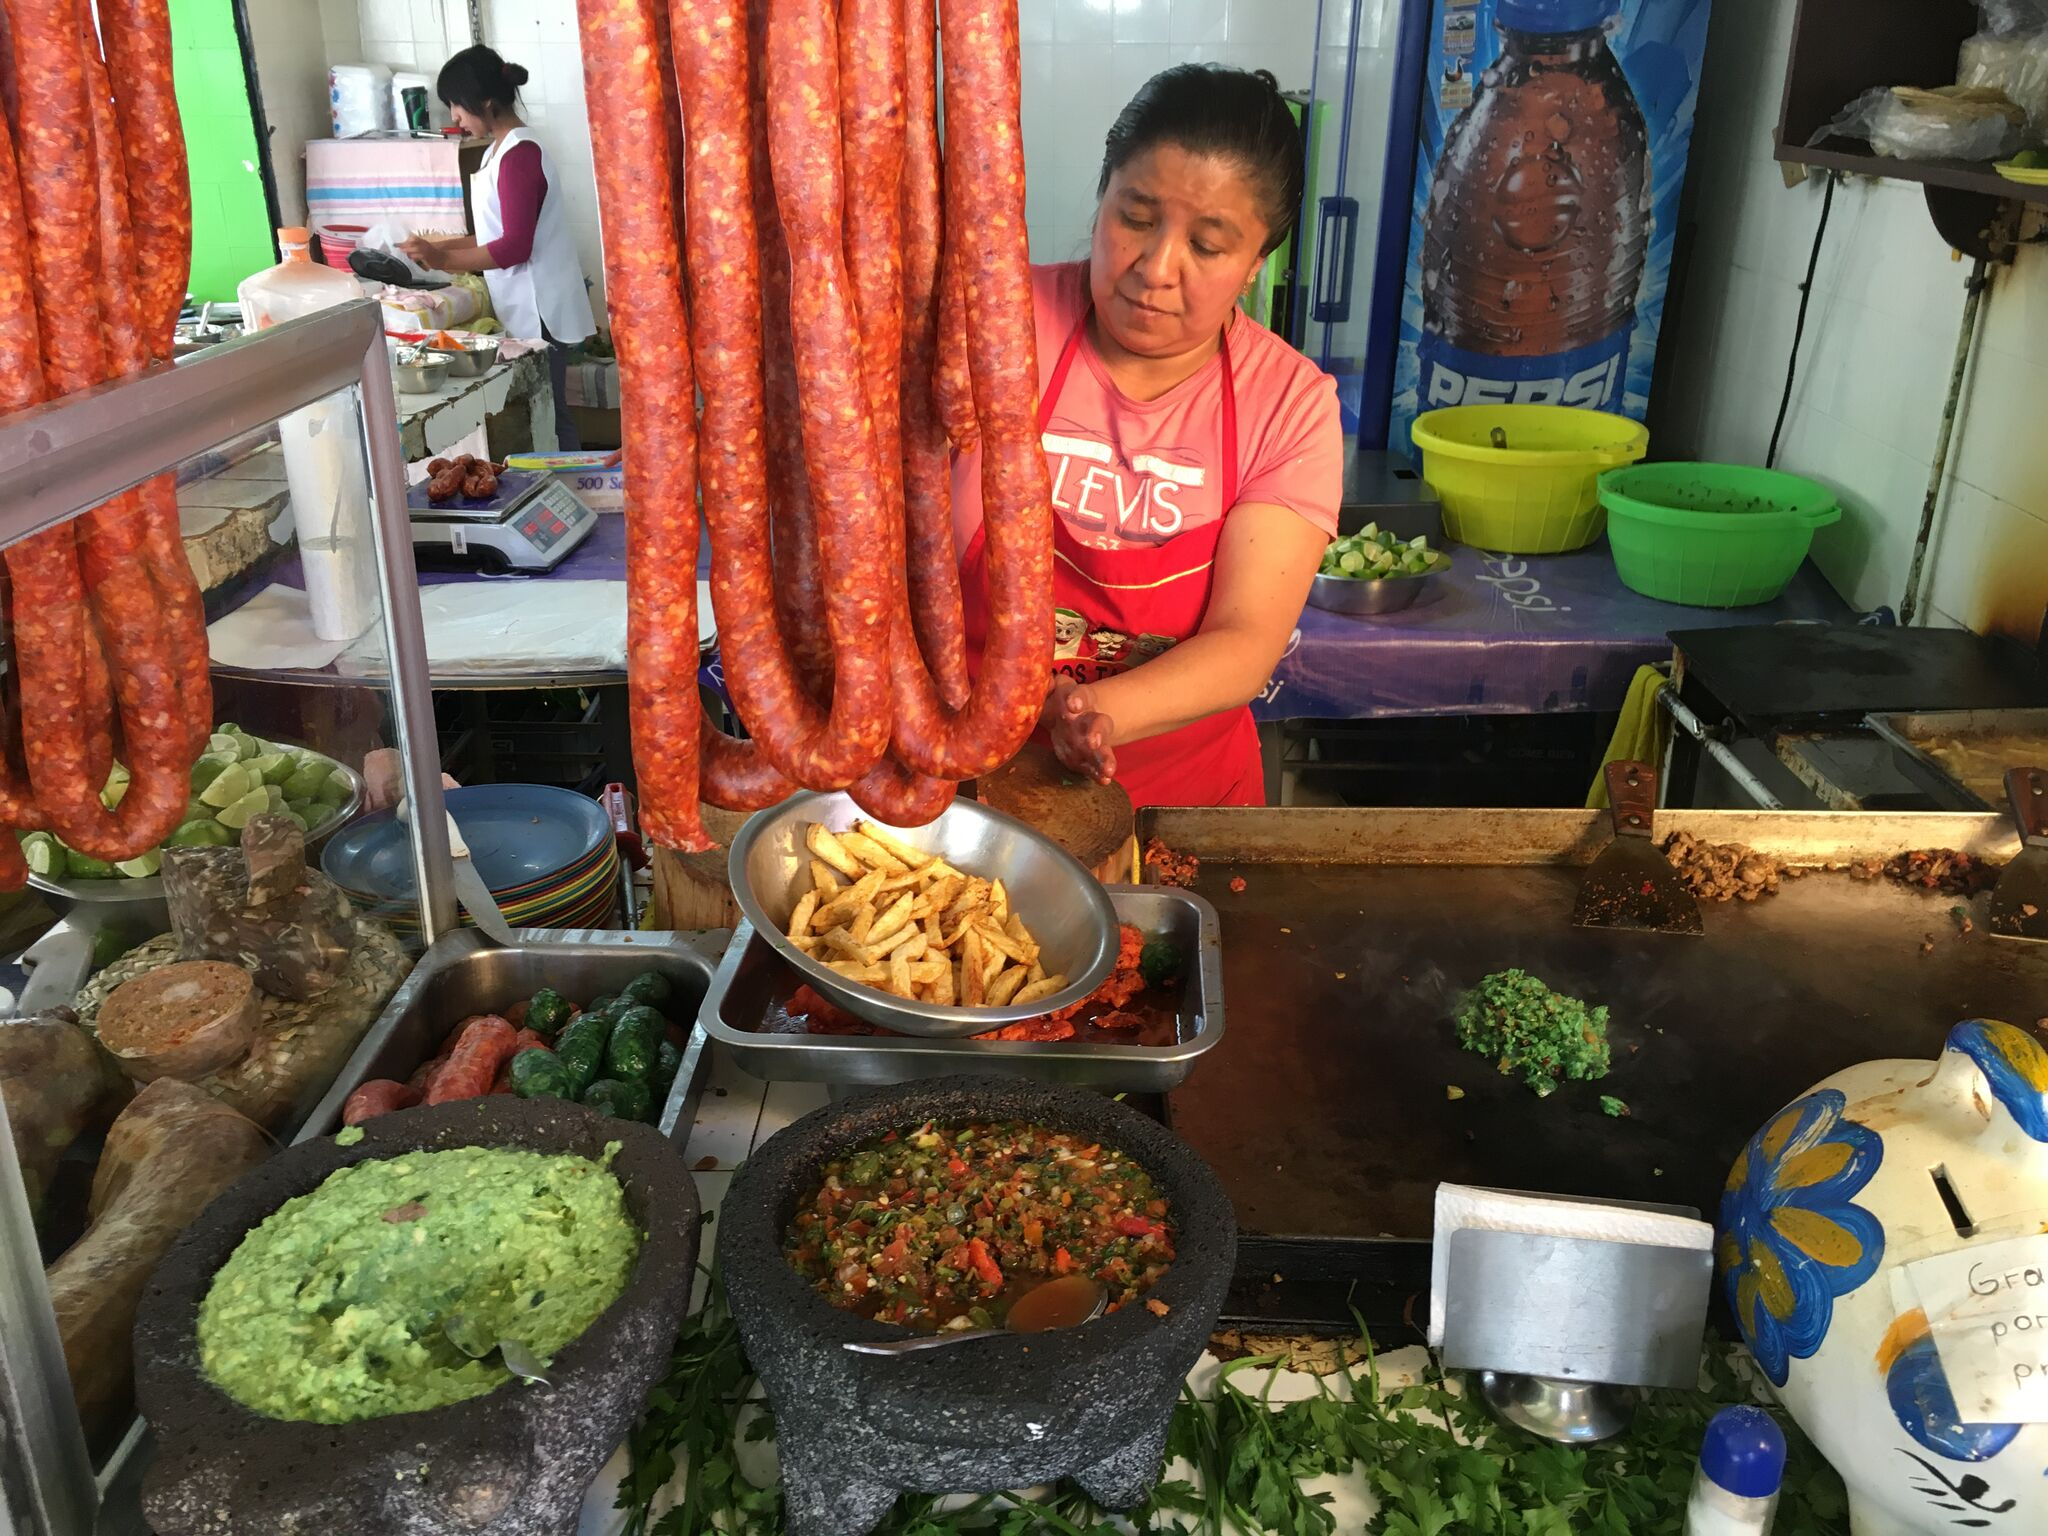 Making tacos de longaniza in Mexico City. Photo: Kiki